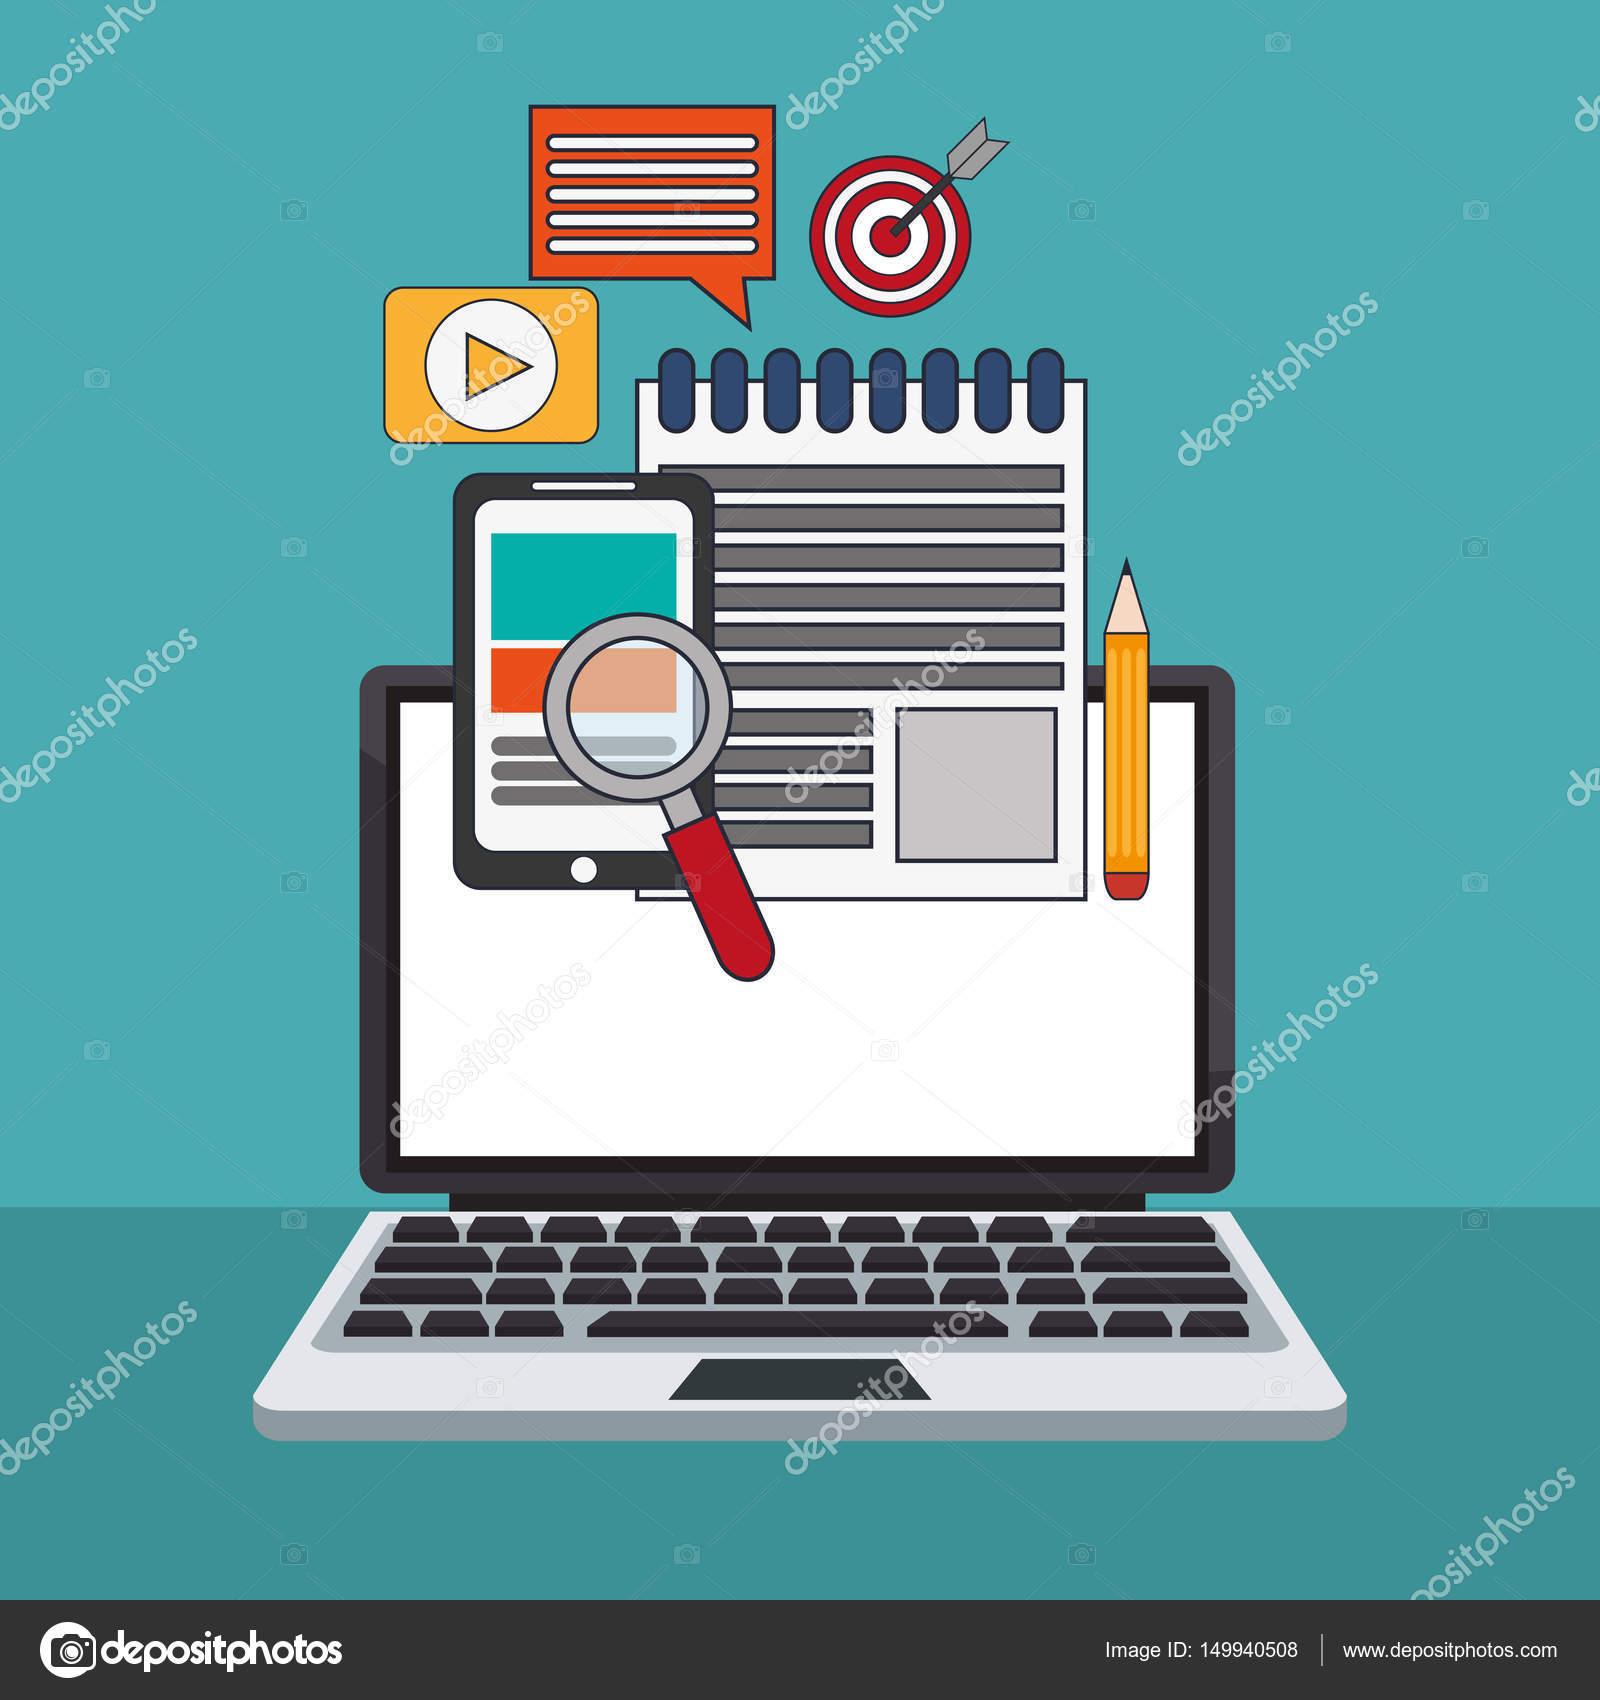 Digital Marketing Networking System Image Stockvektor Jemastock